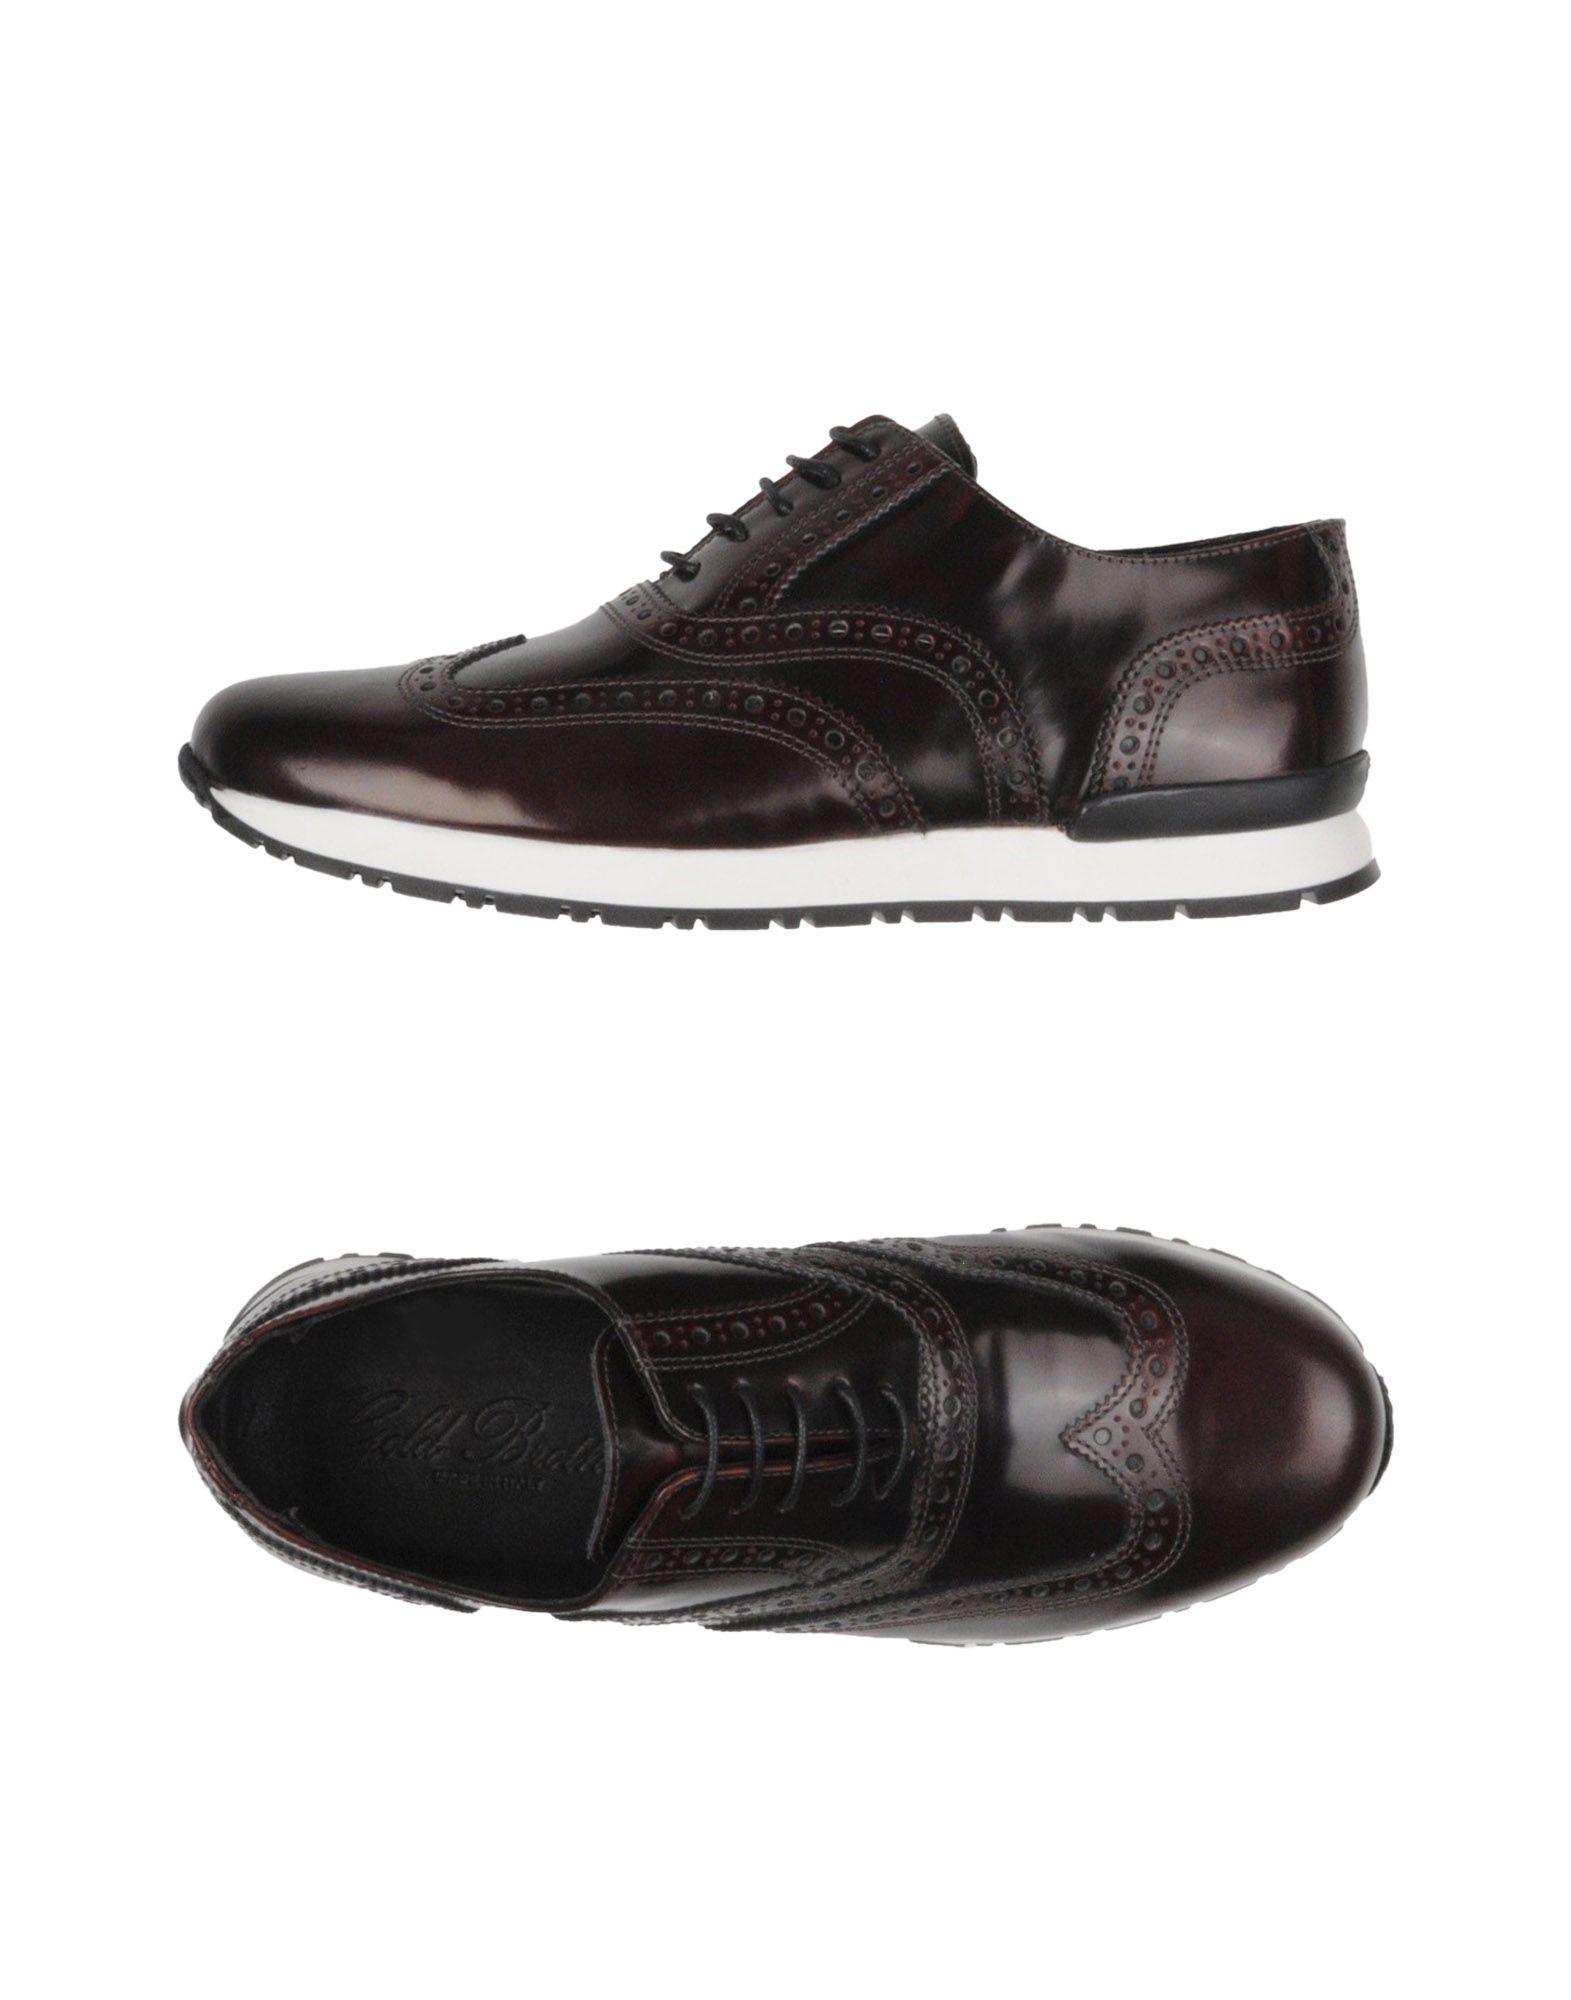 Gold Brothers Mokassins Herren  Schuhe 11276349GP Gute Qualität beliebte Schuhe  7fdefc